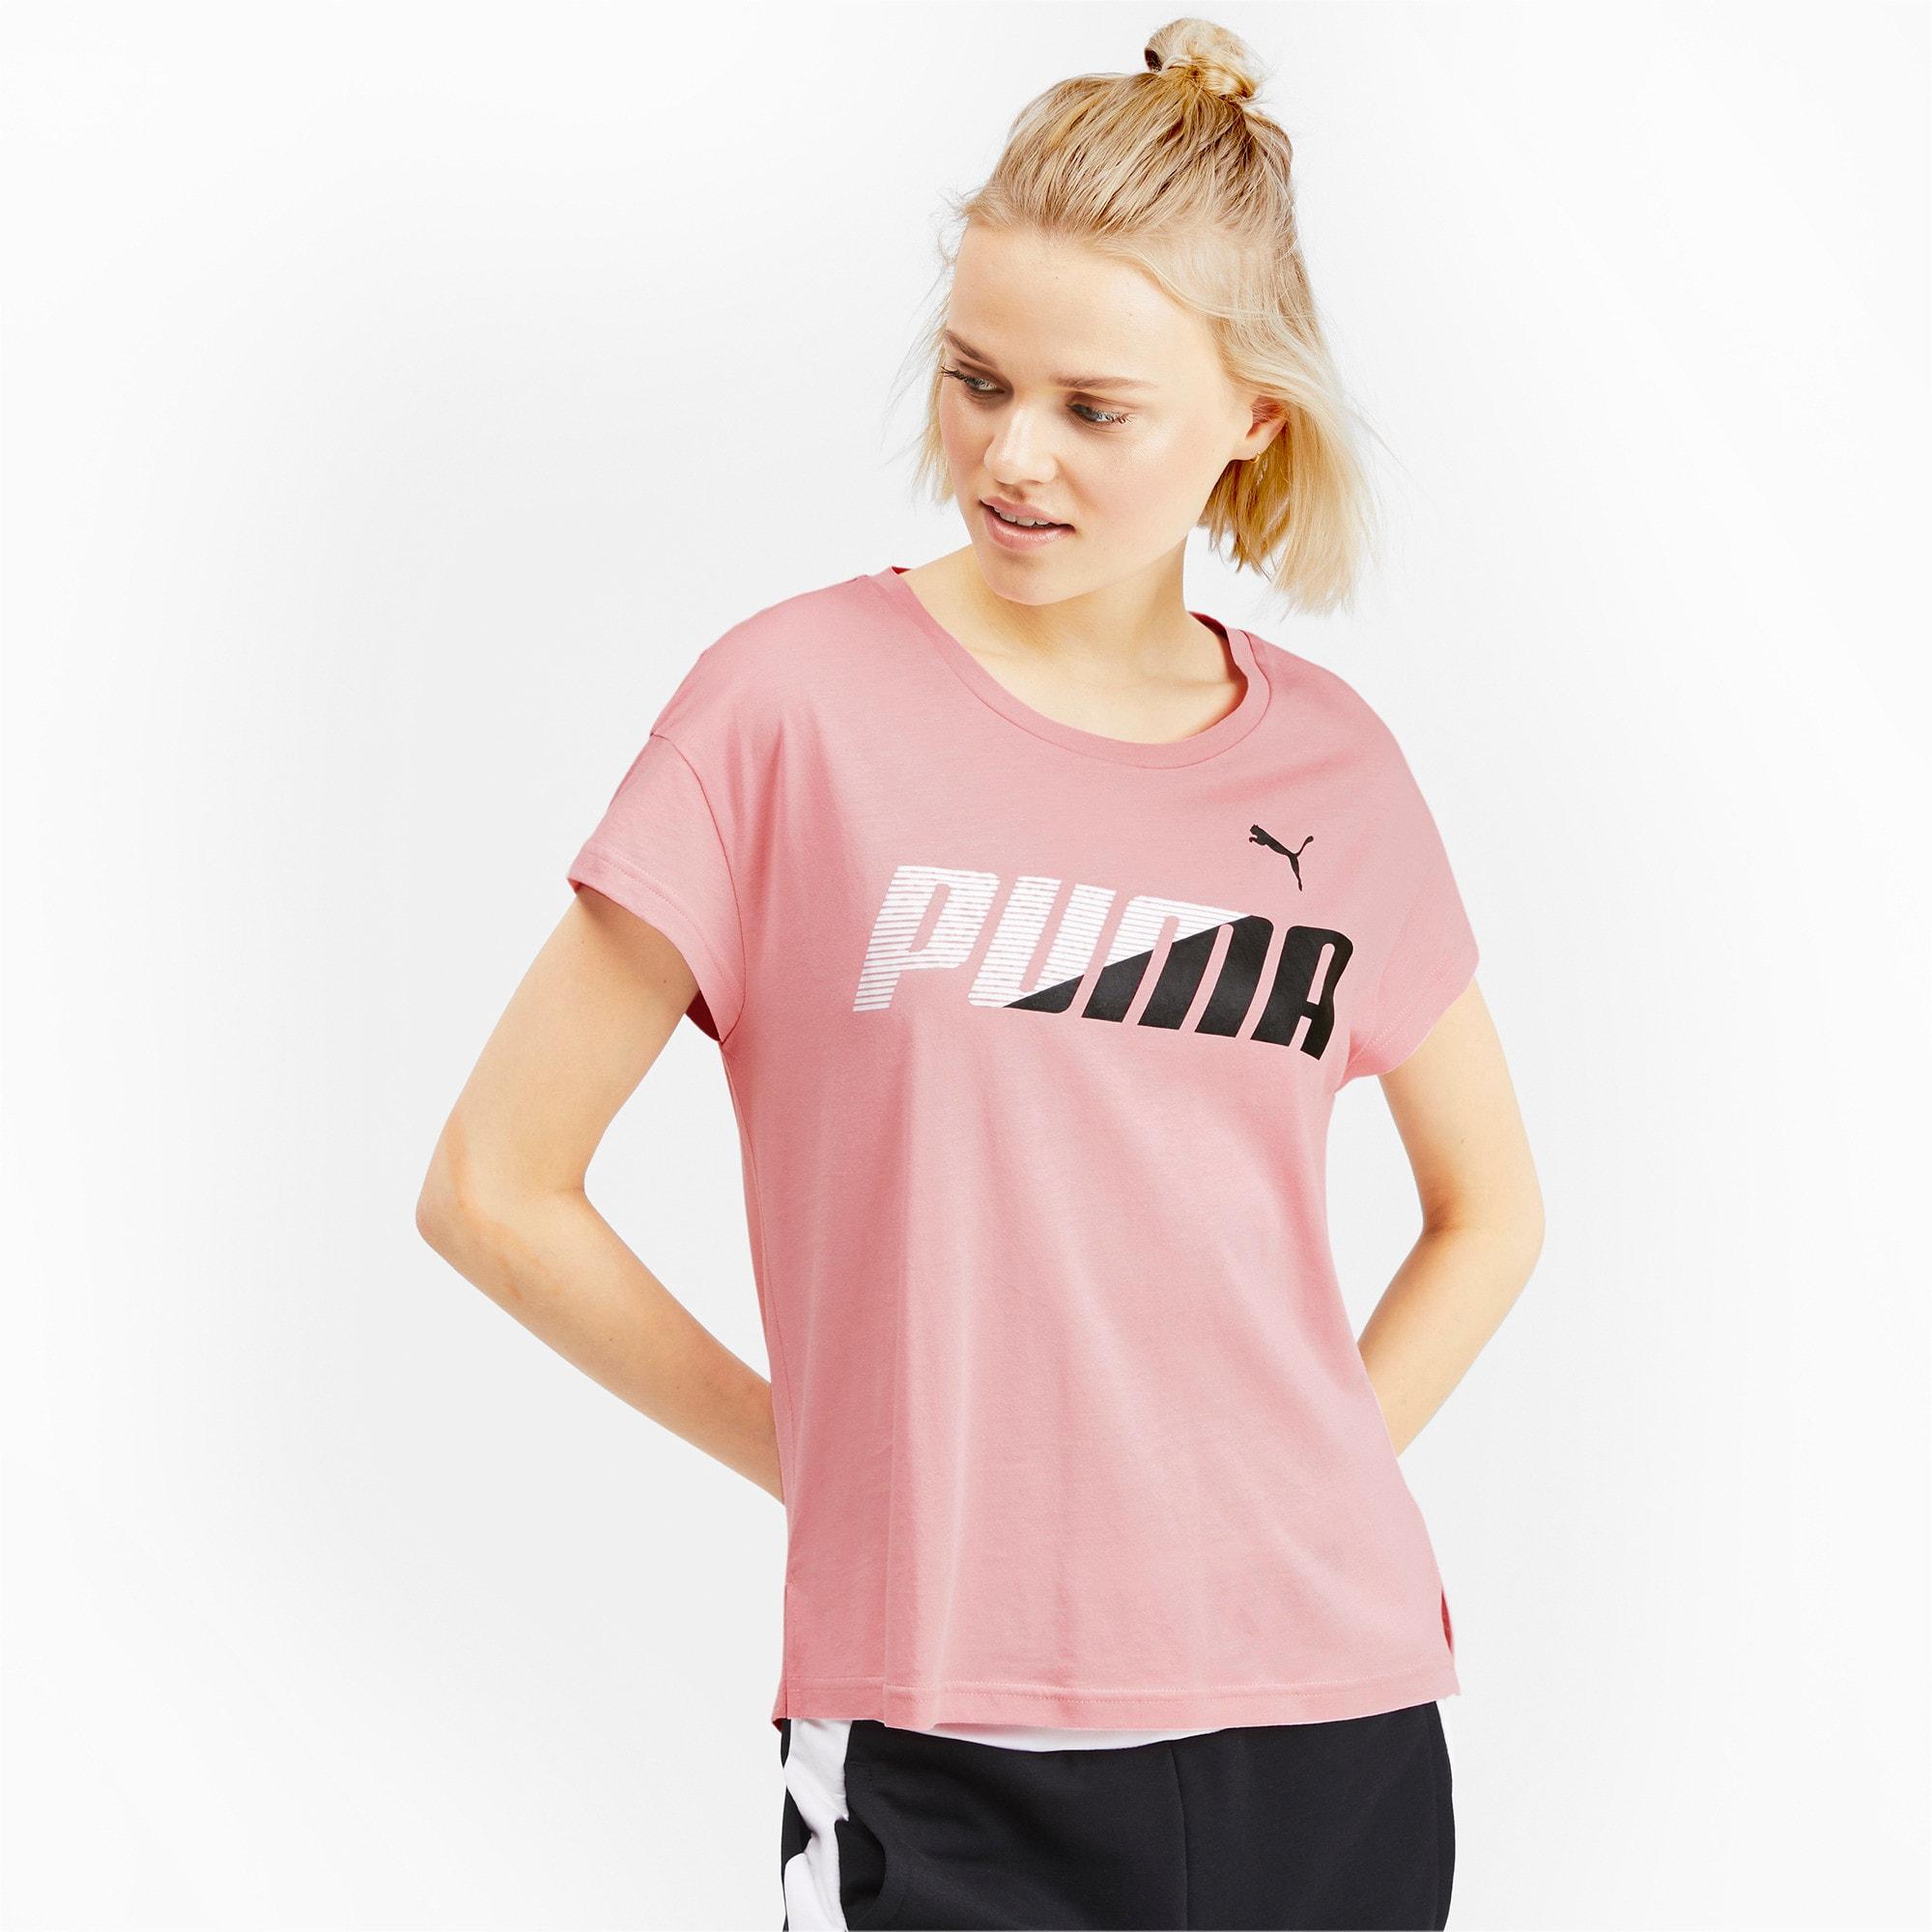 Miniatura 1 de Camiseta estampadaModernSports de mujer, Bridal Rose, mediano